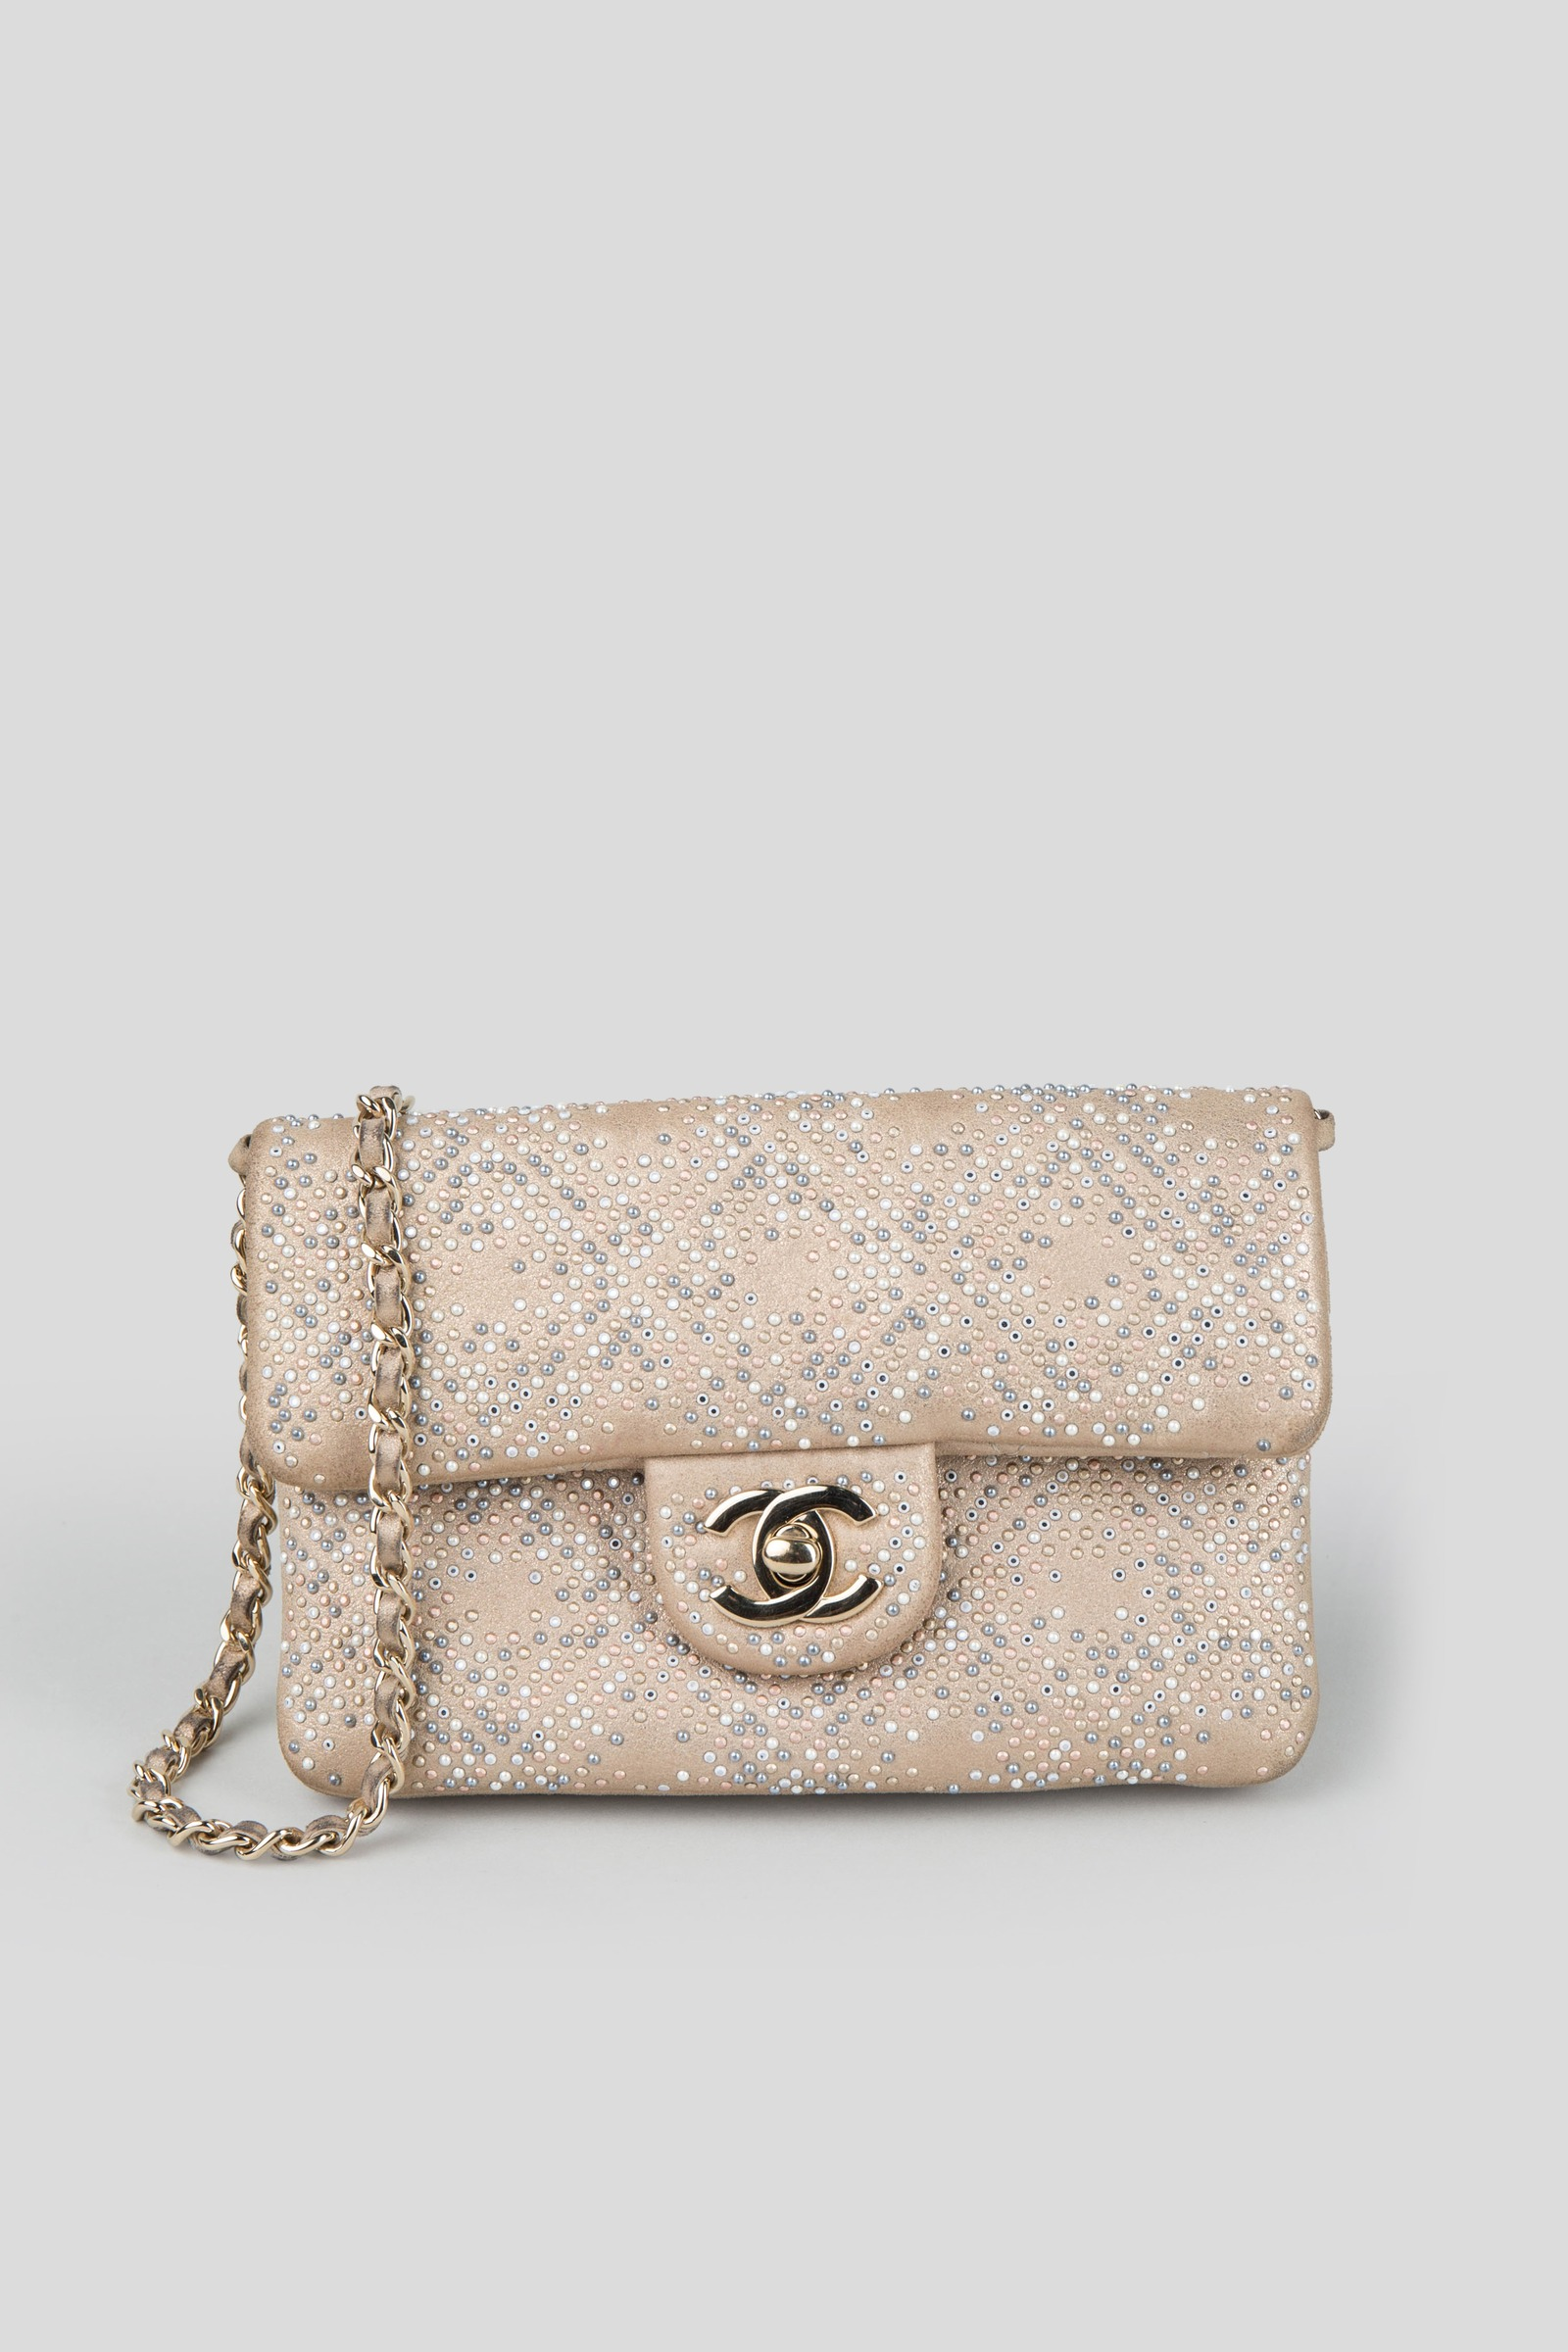 9477cc2ebf52da Rent CHANEL Embellished Cross Body Bag in Dubai - Designer 24